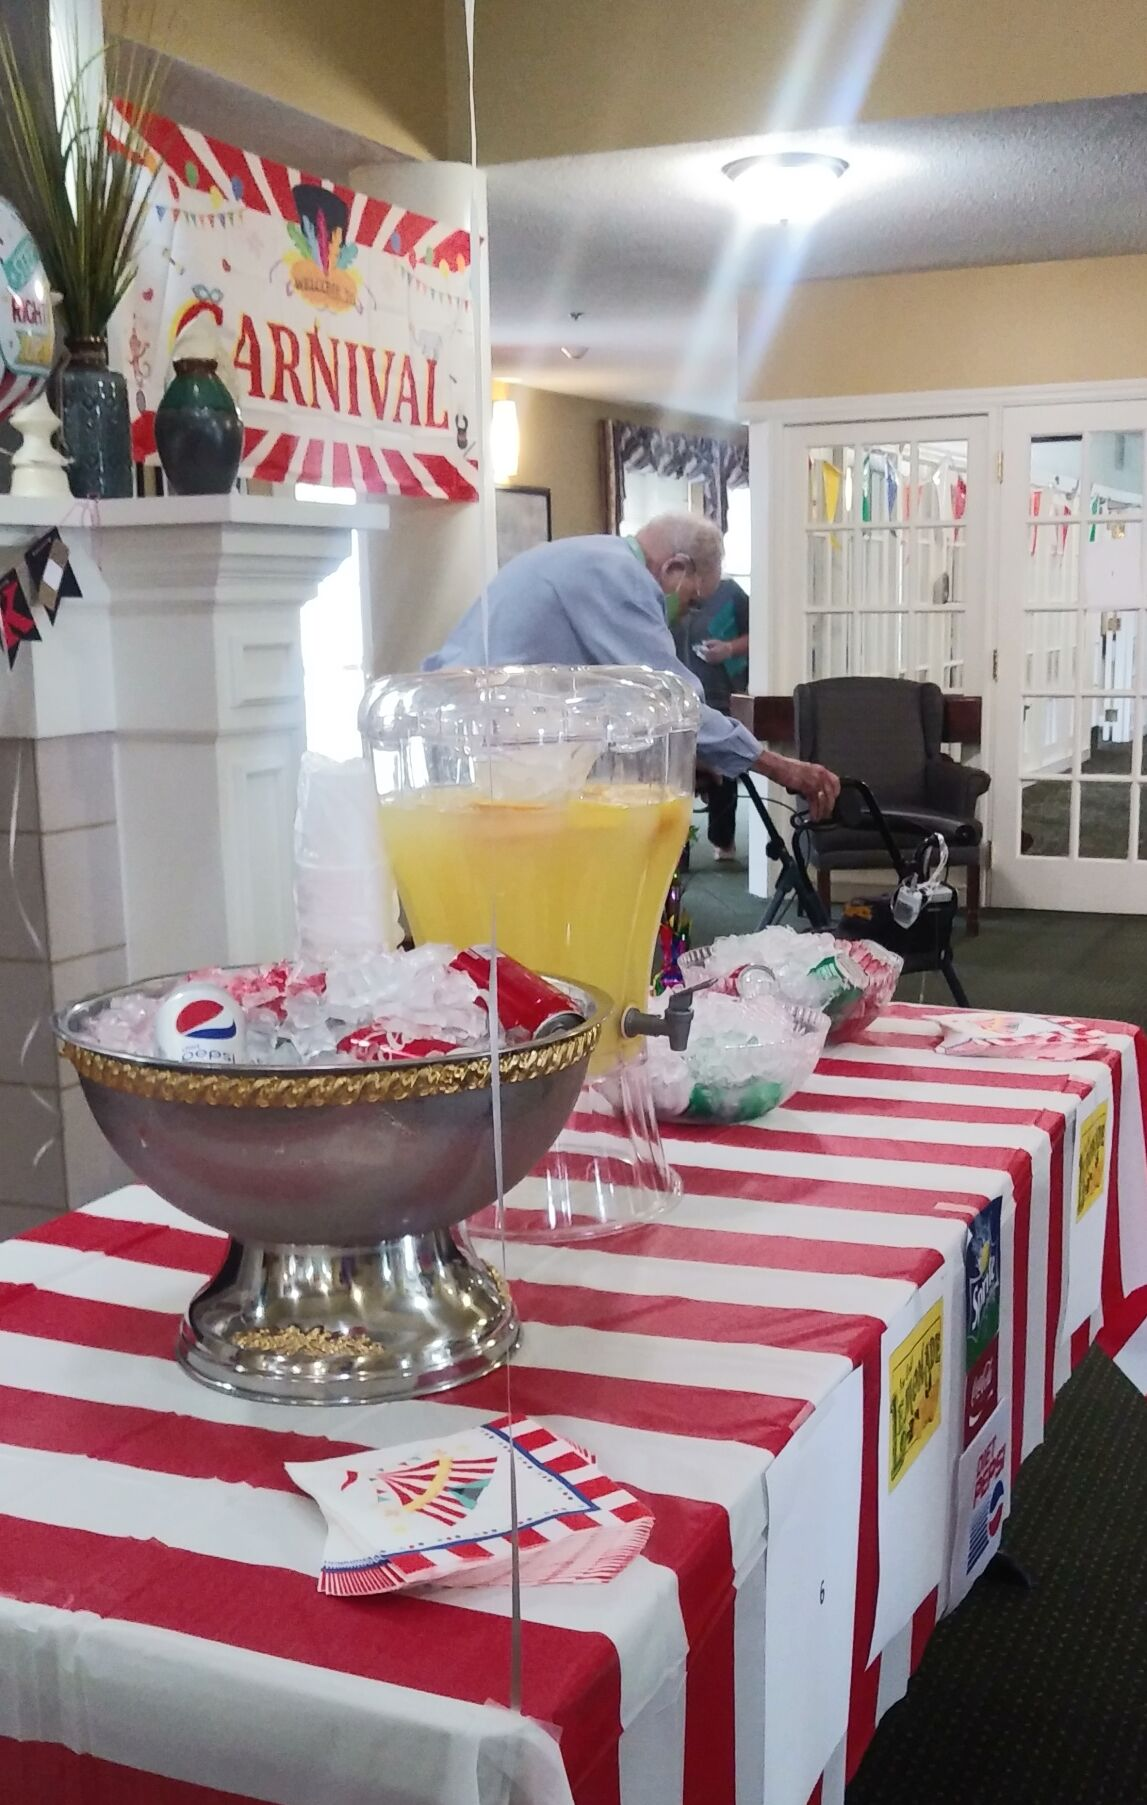 Elmcroft of Kingsport Brings Carnival to Residents